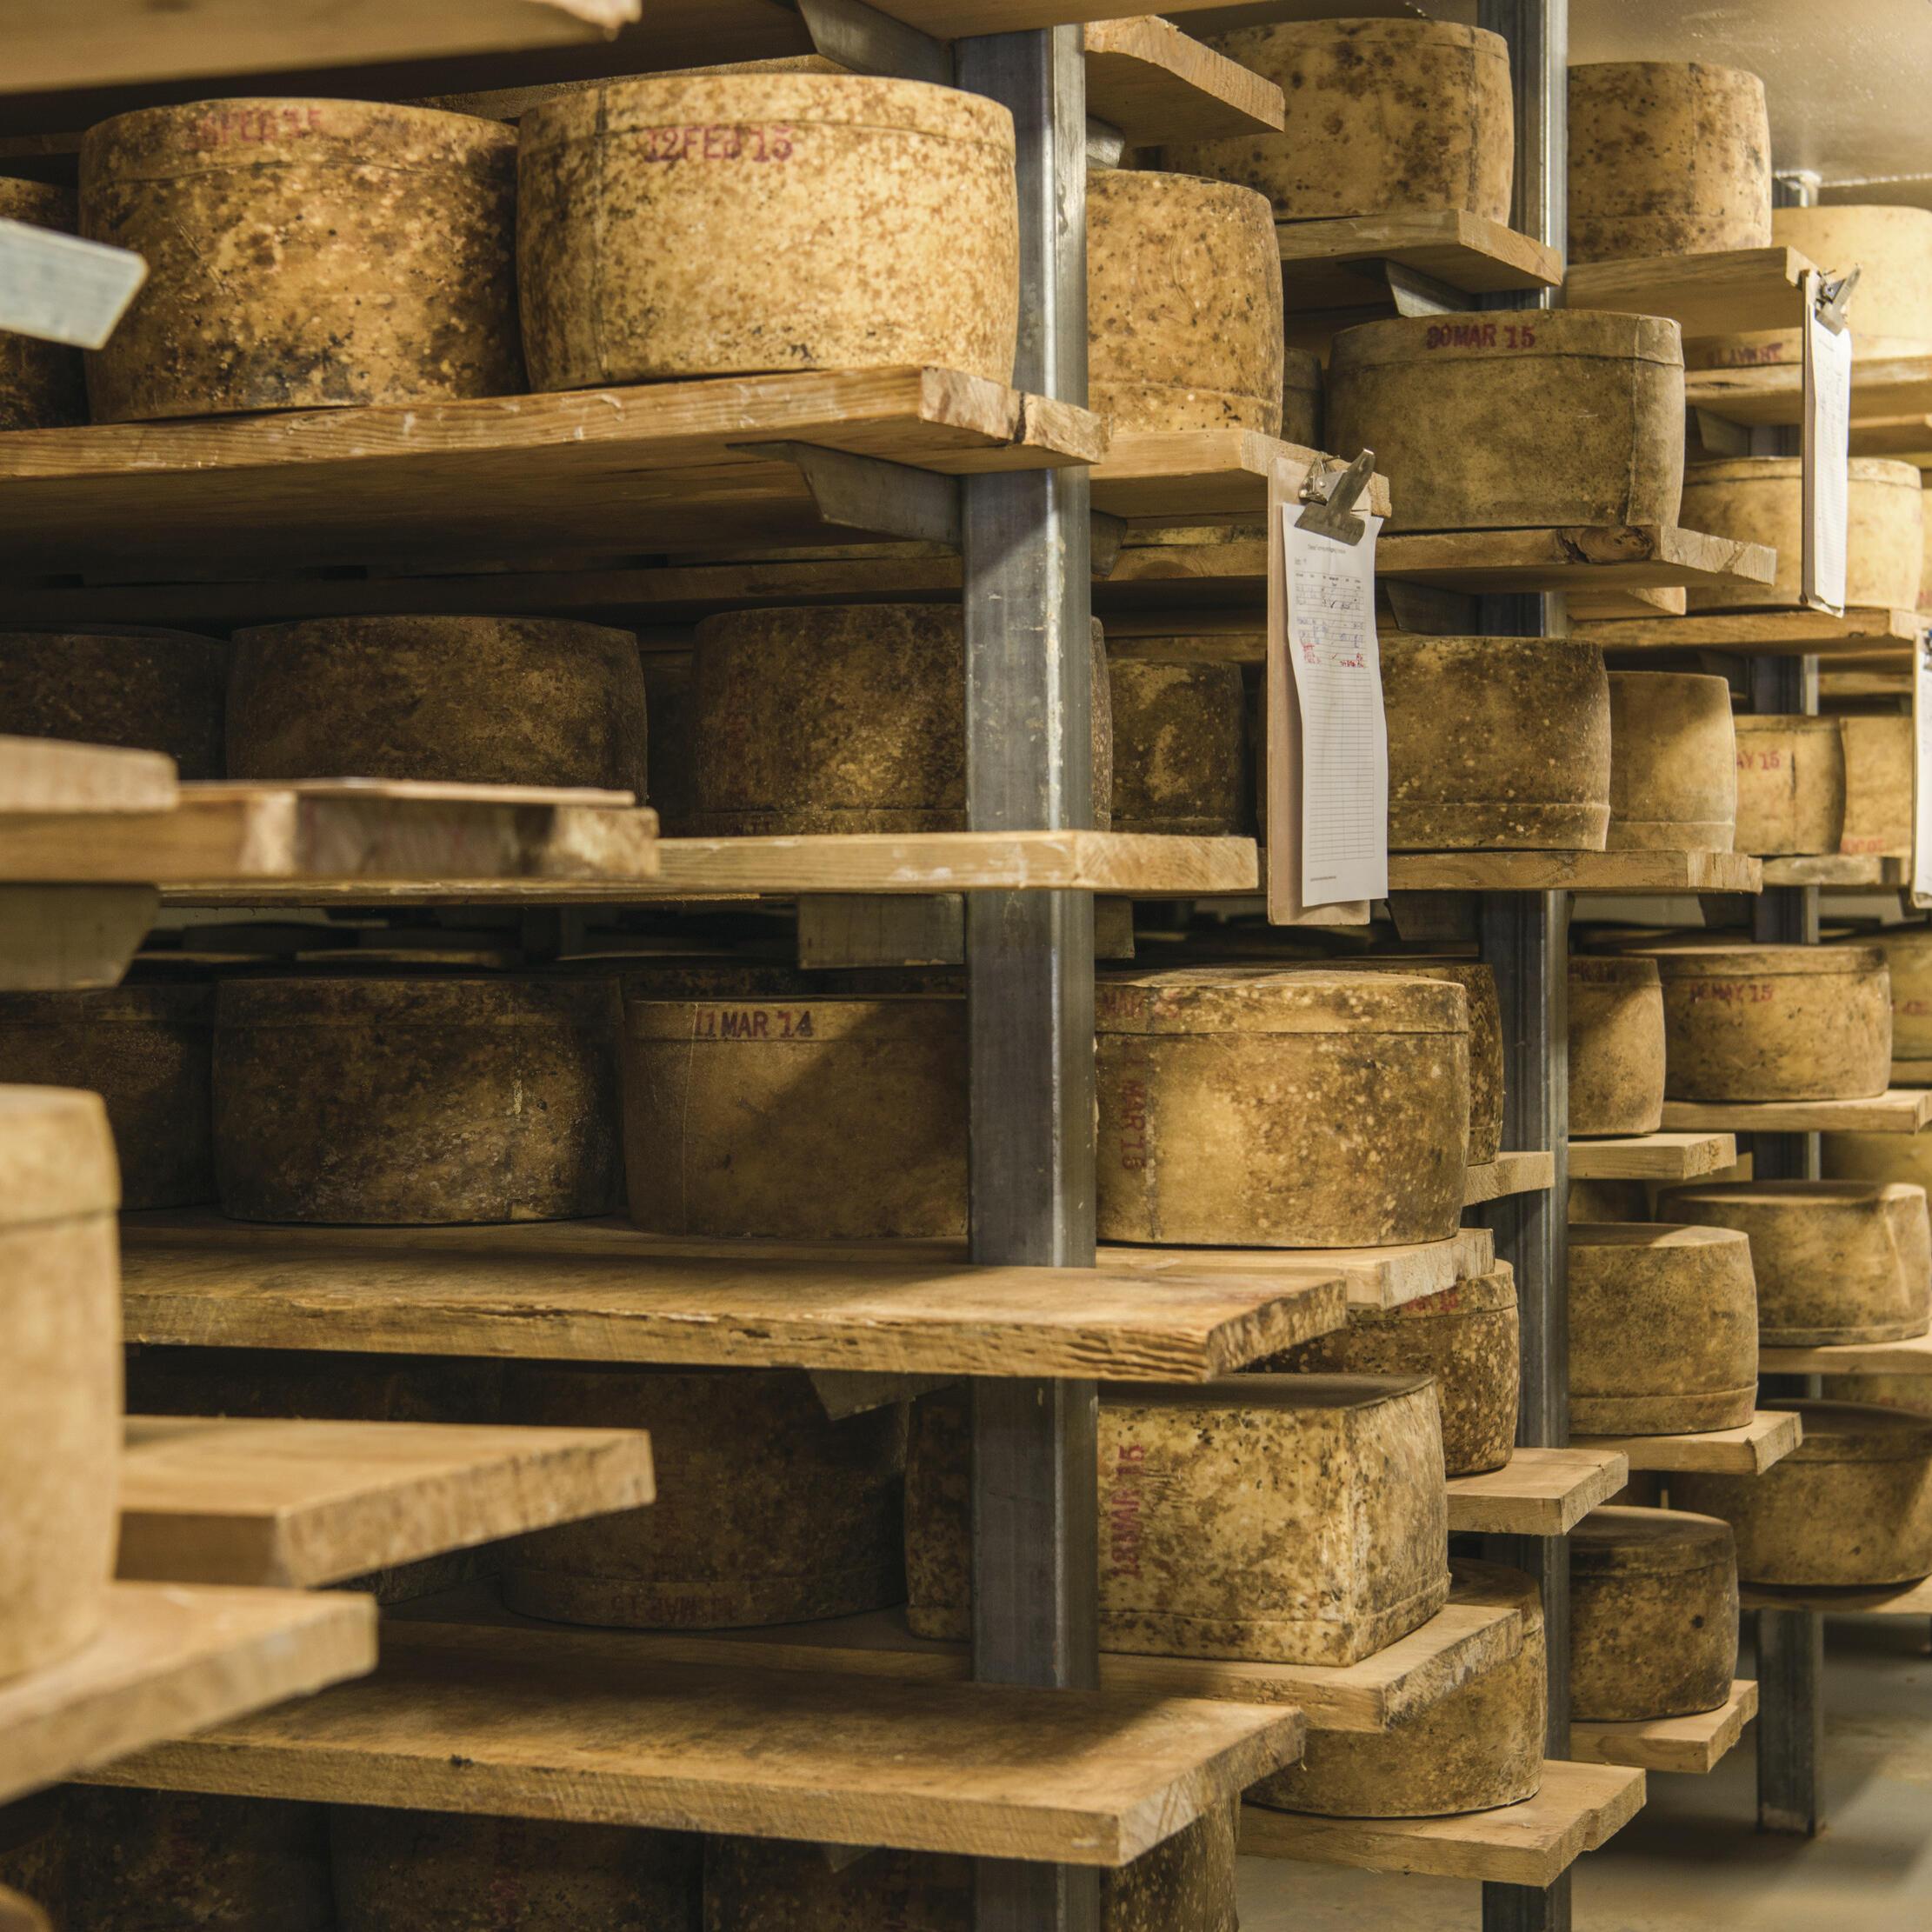 flavors of Tasmania in shelves at Freycinet Lodge